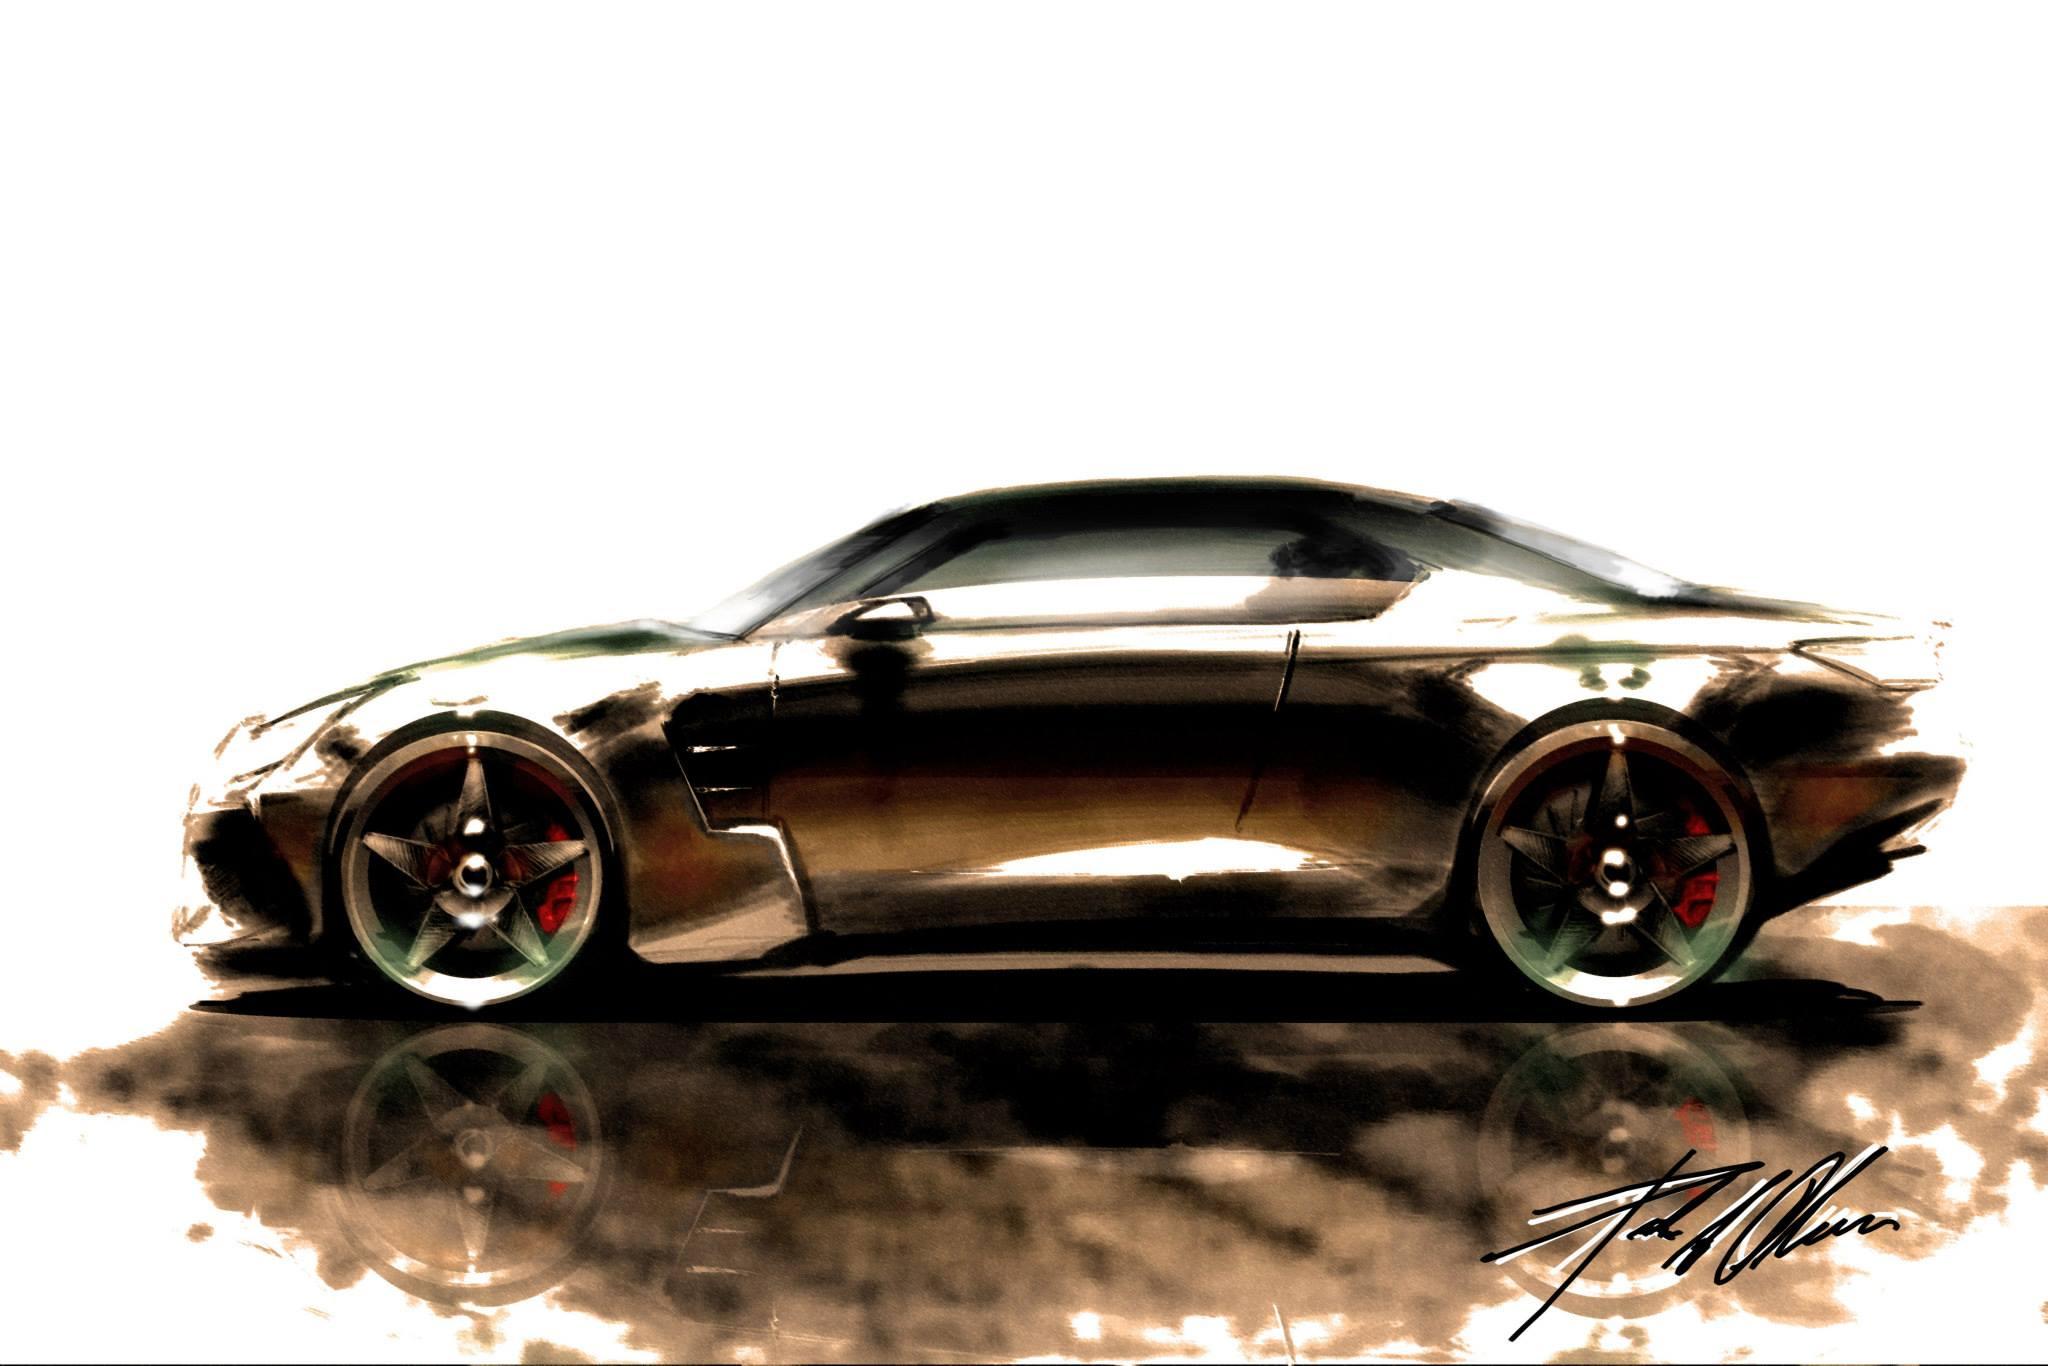 Peik Olsen side profile car